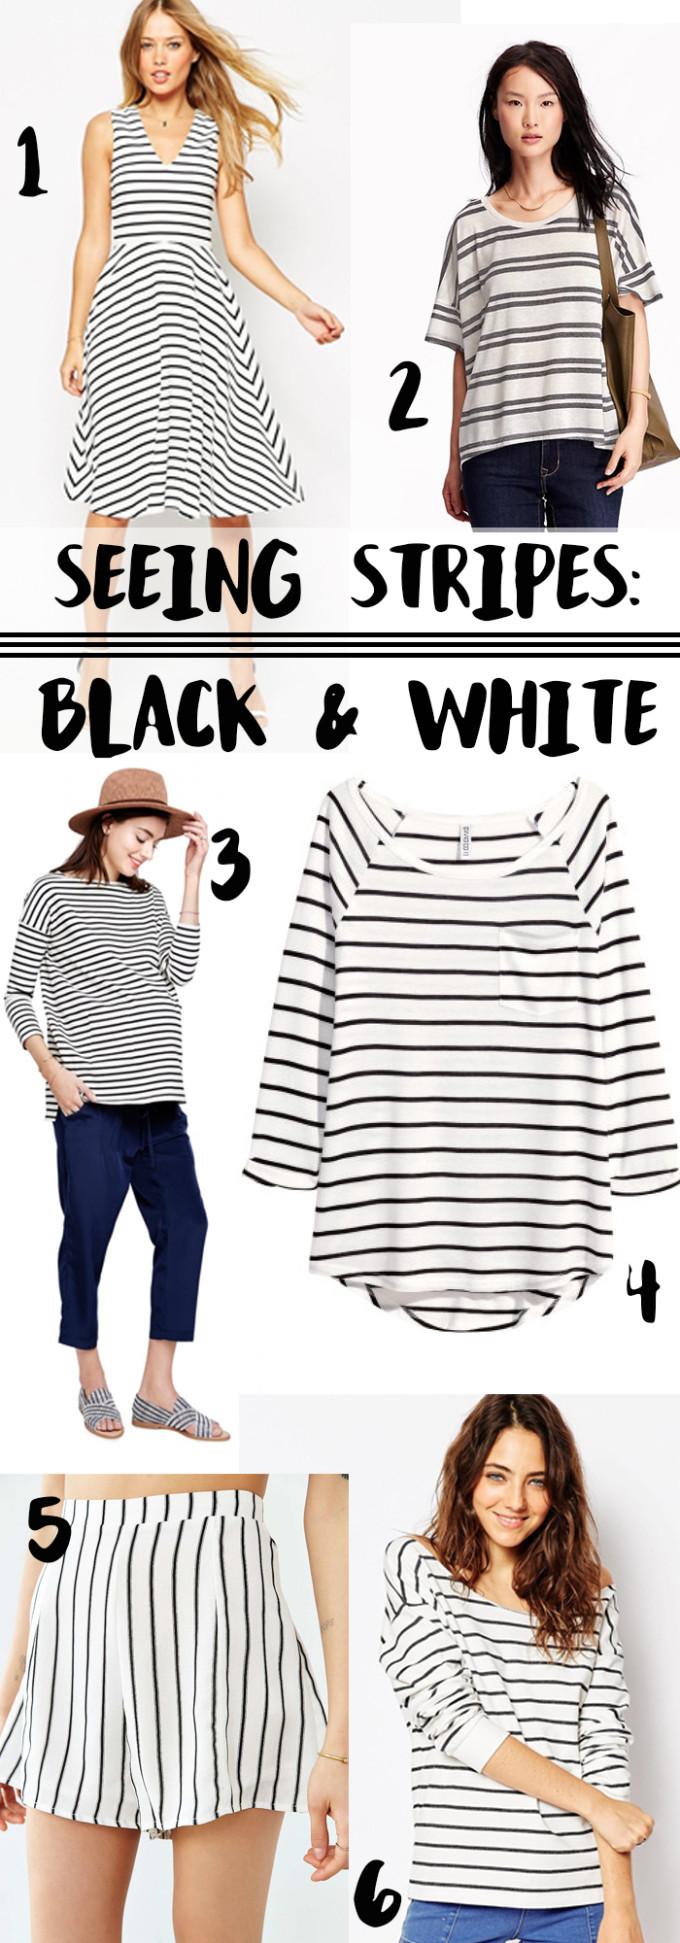 Seeing Stripes: Black and White // www.thehiveblog.com